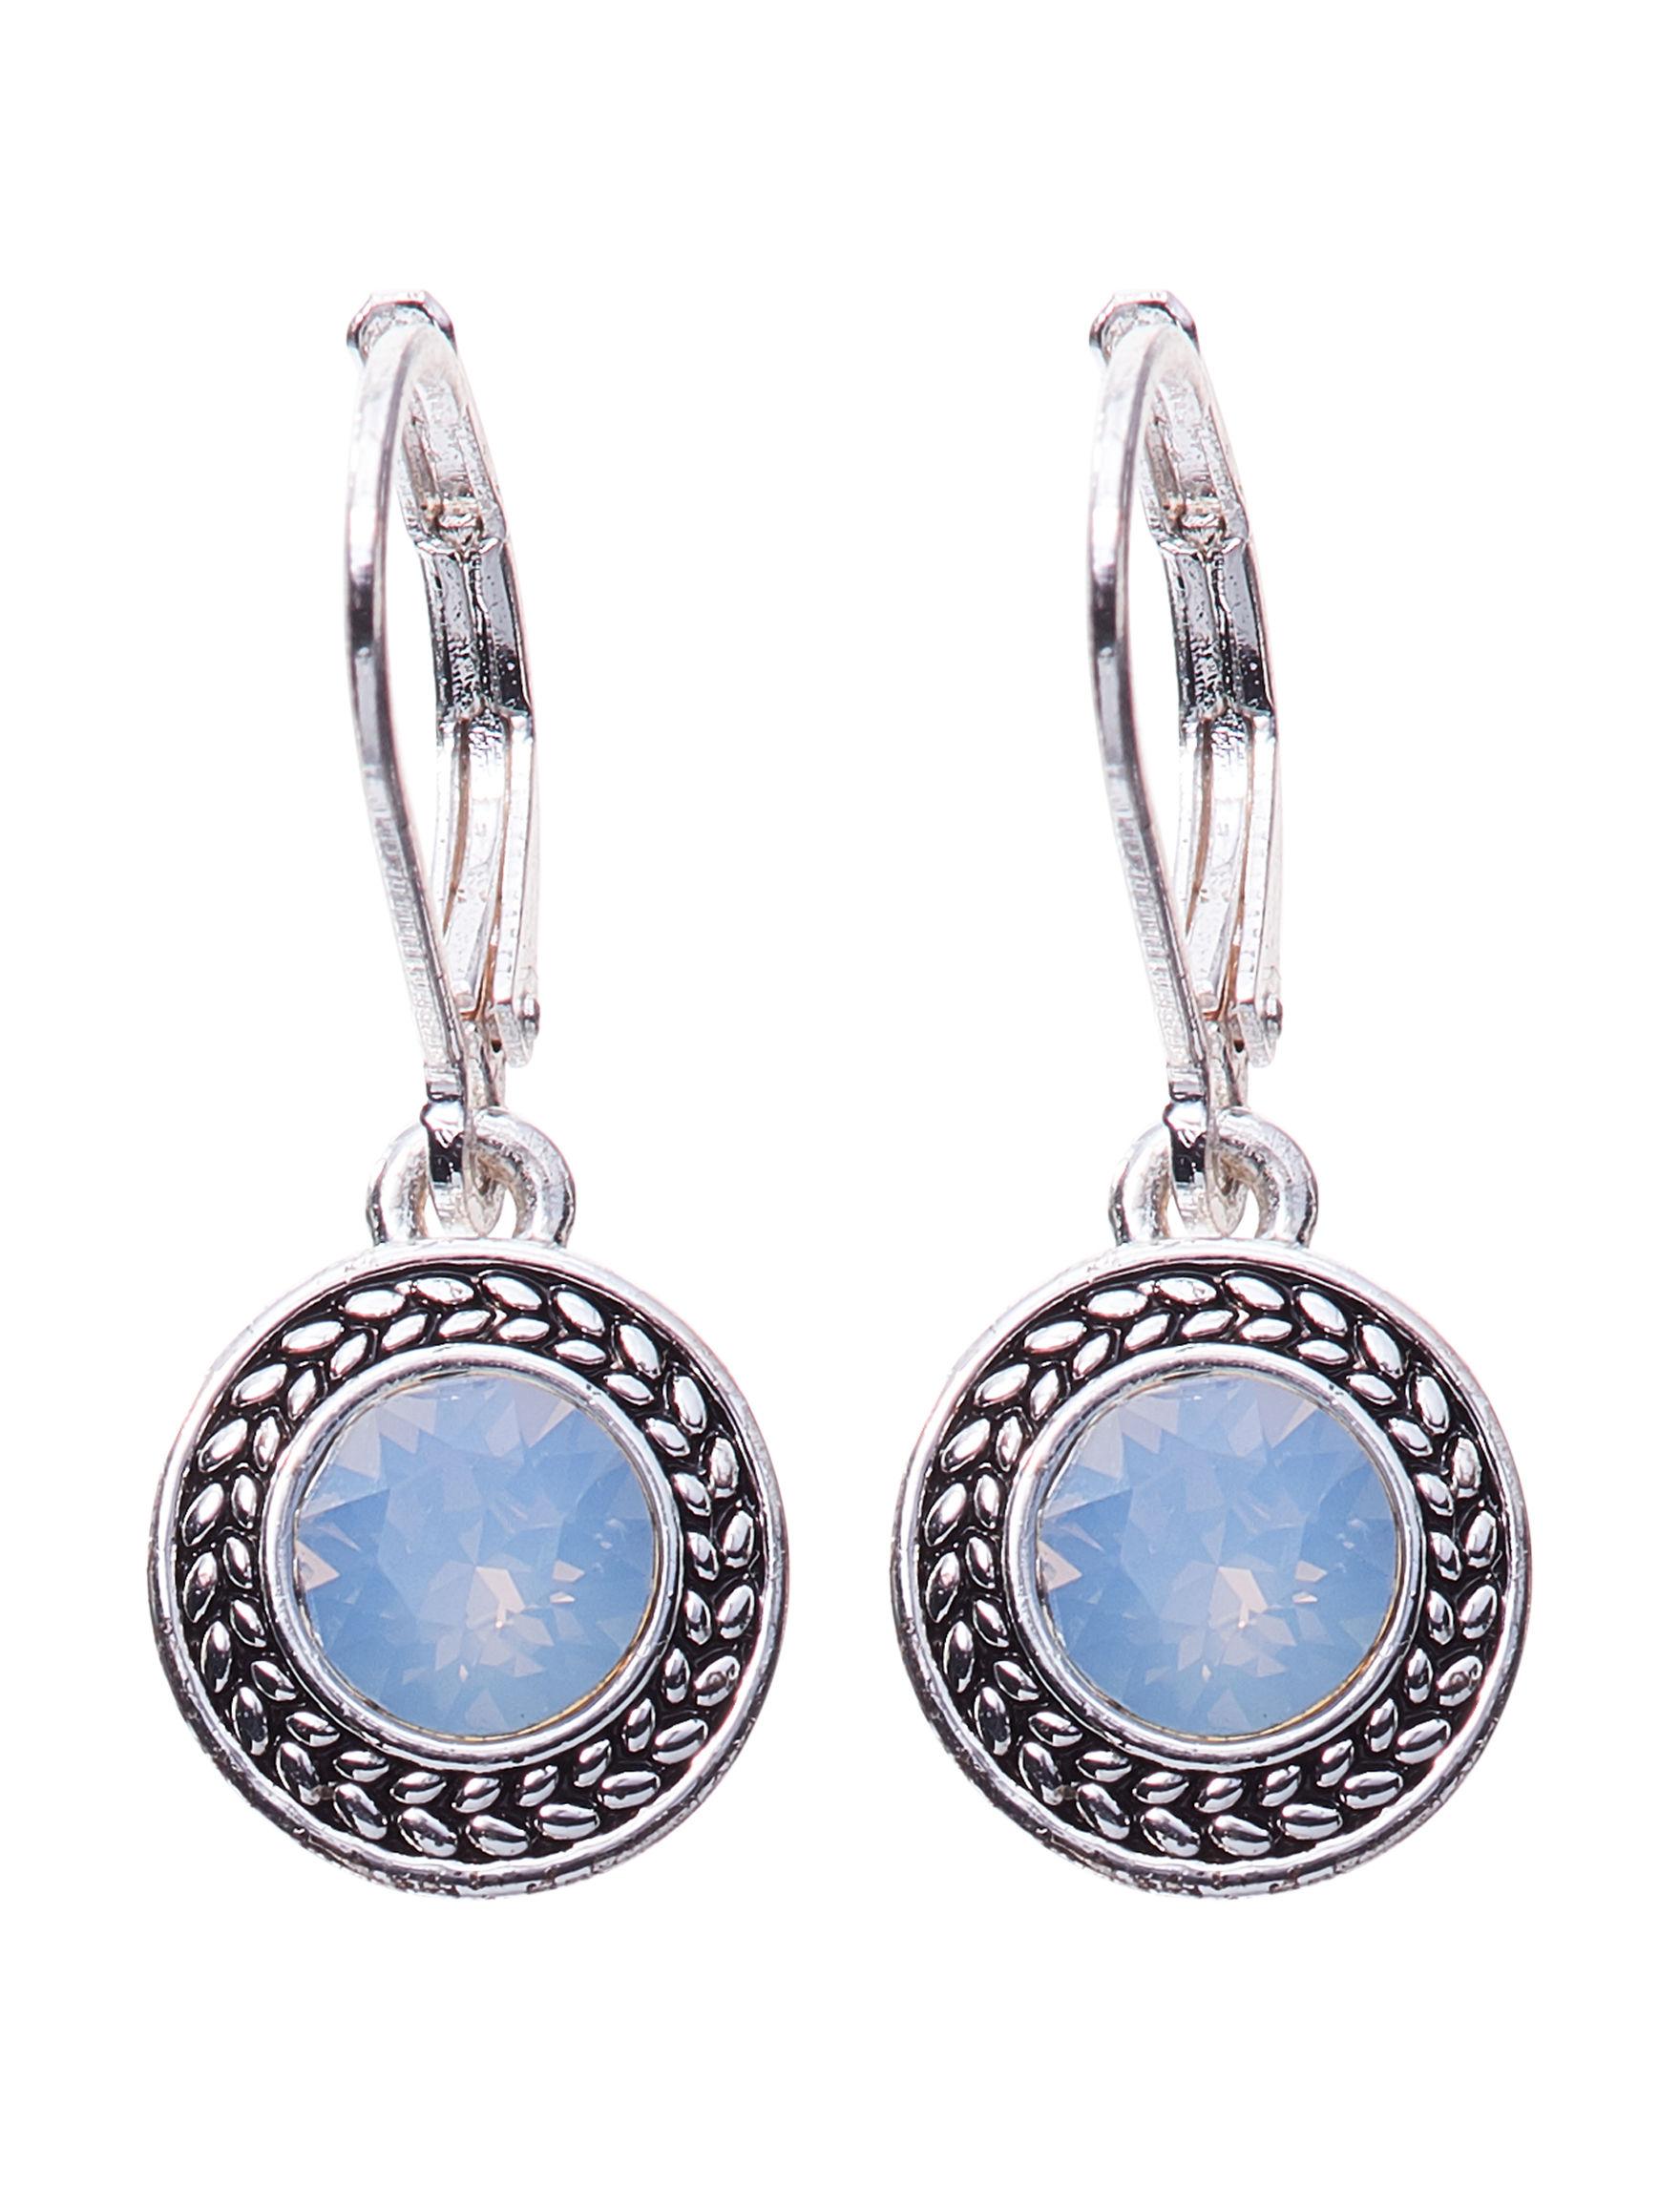 Napier Blue Stone Drops Earrings Fashion Jewelry